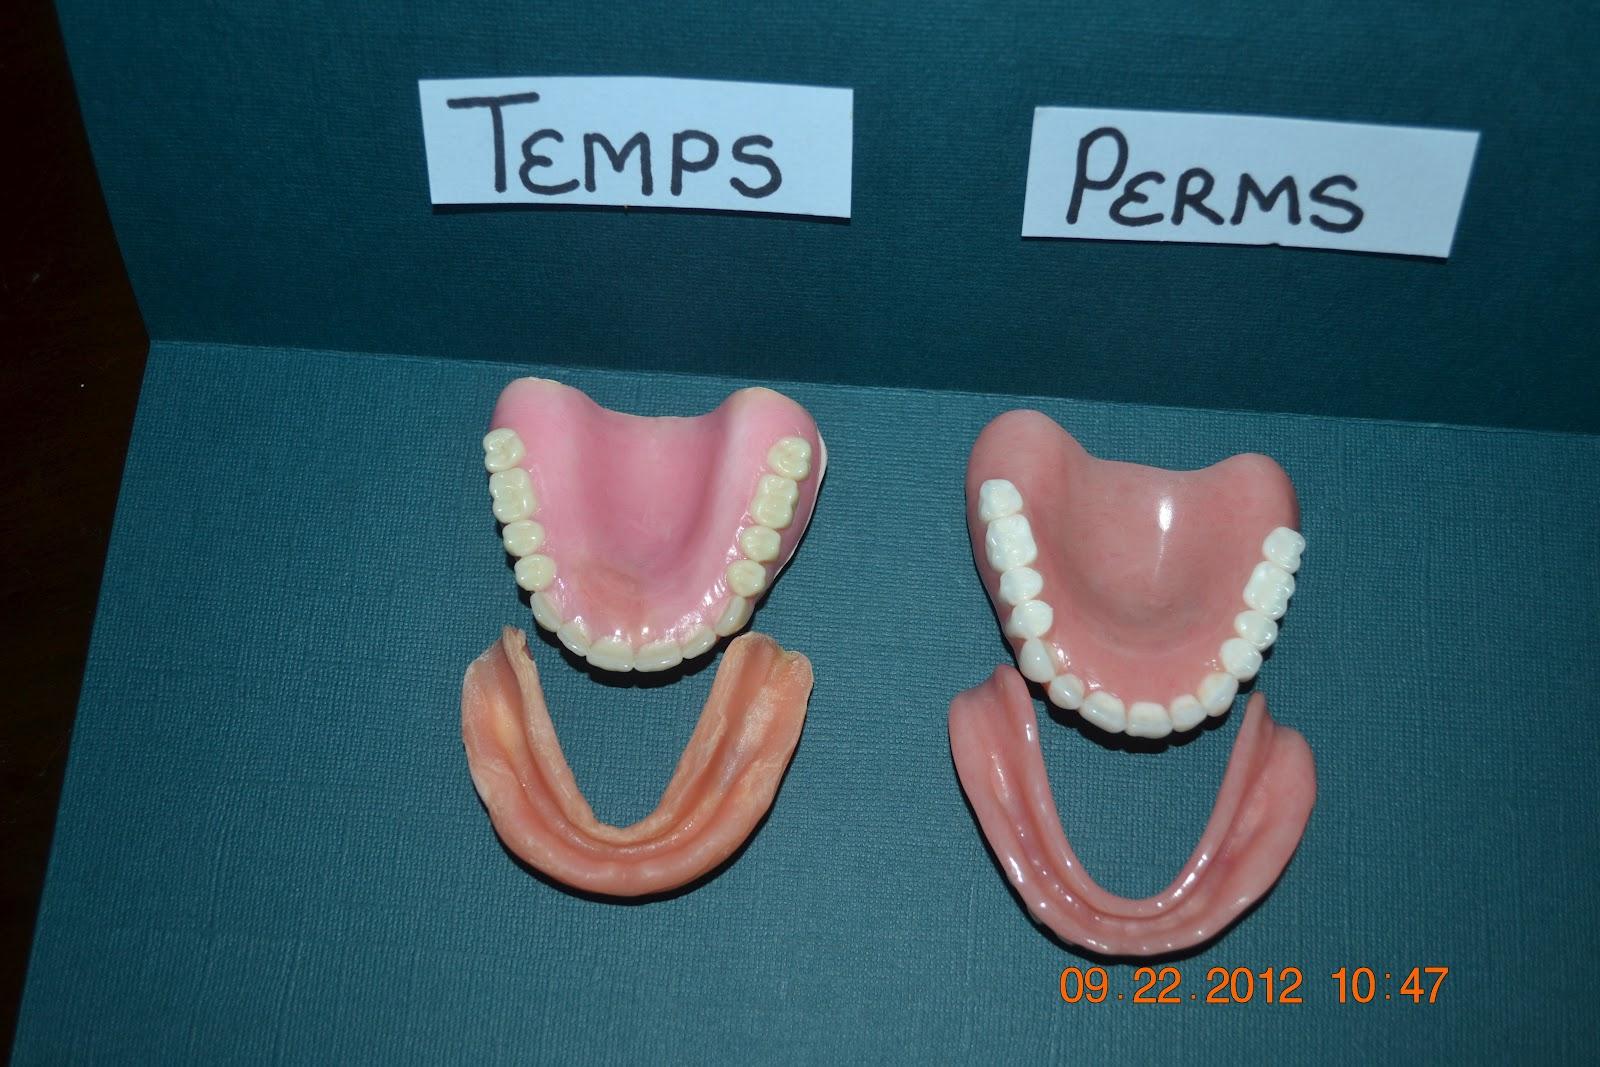 Temporary vs permanent dentures iweardentures permanent dentures solutioingenieria Image collections